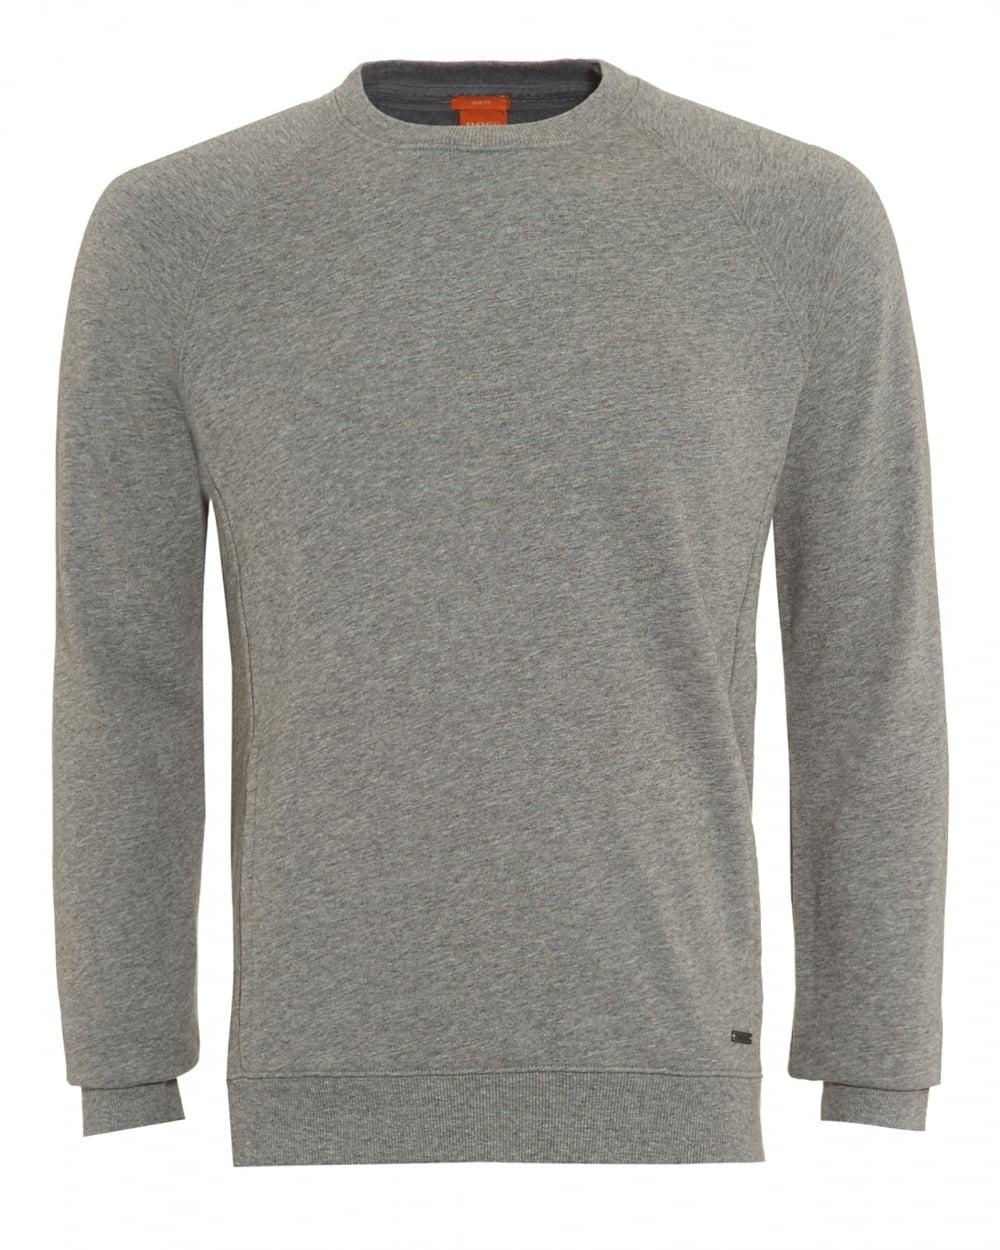 Mens Sweater, Wheel Slim Fit Grey Track Top